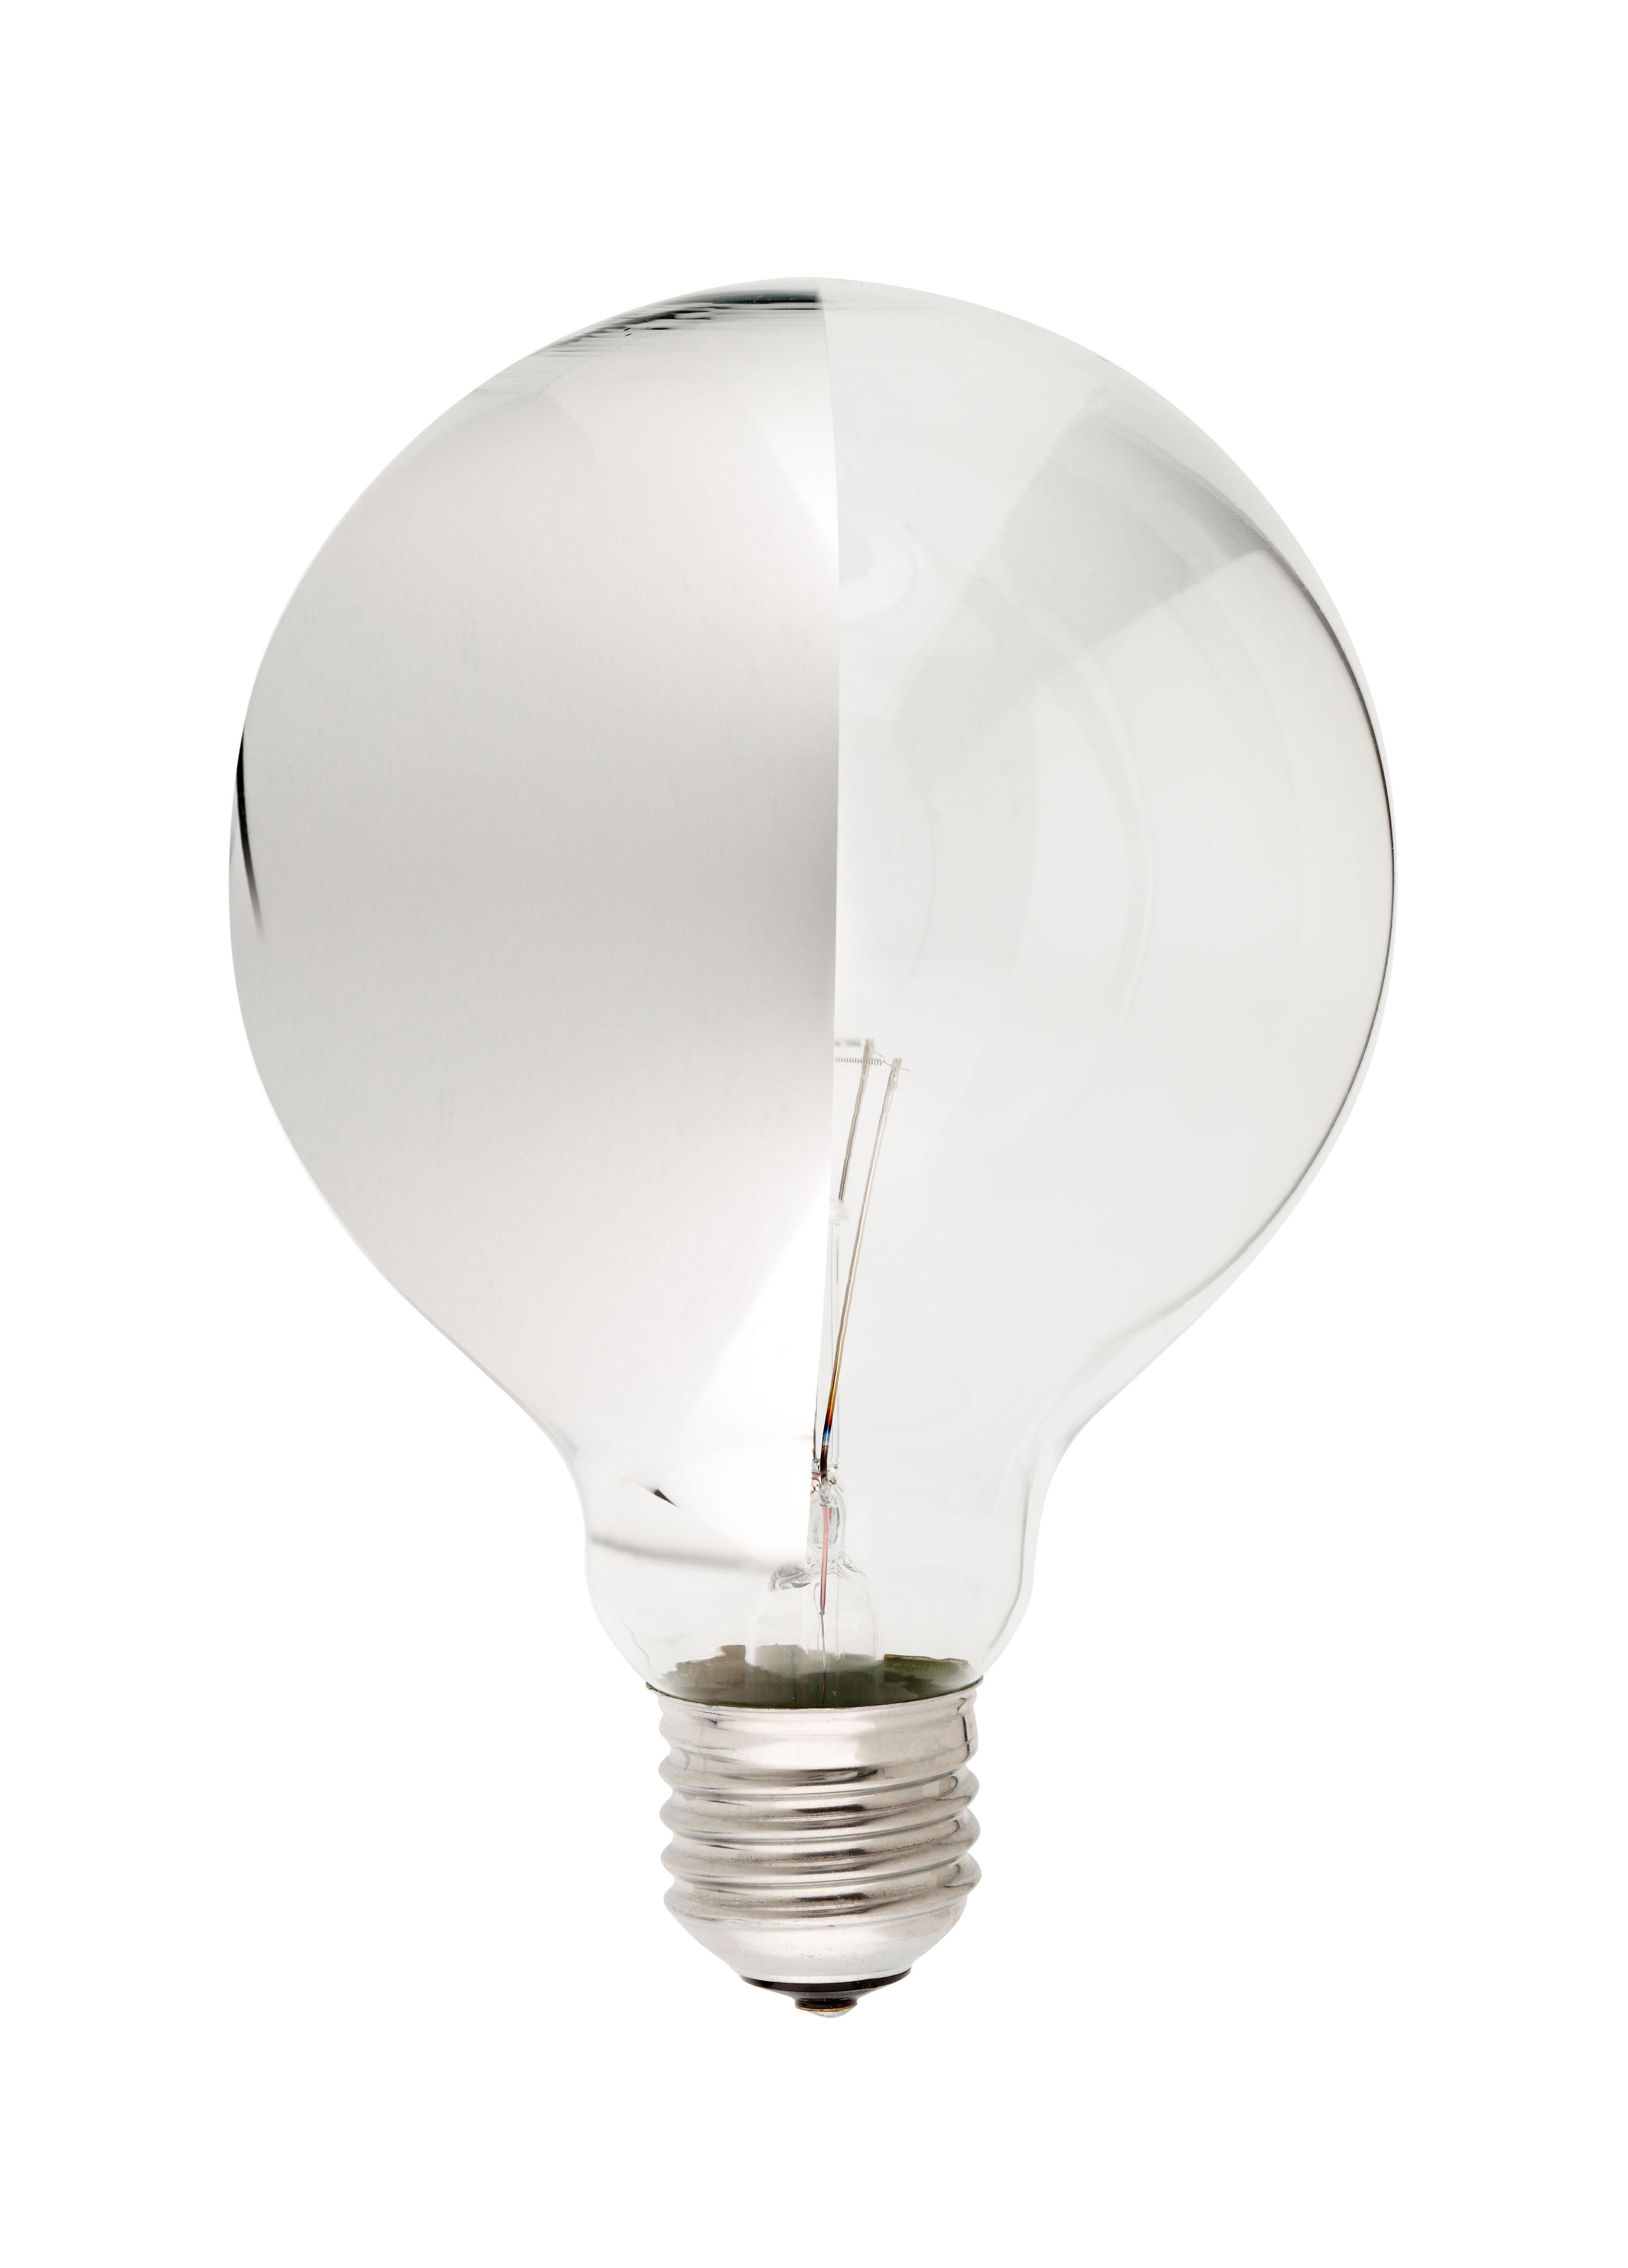 lampe ampoule prozic. Black Bedroom Furniture Sets. Home Design Ideas